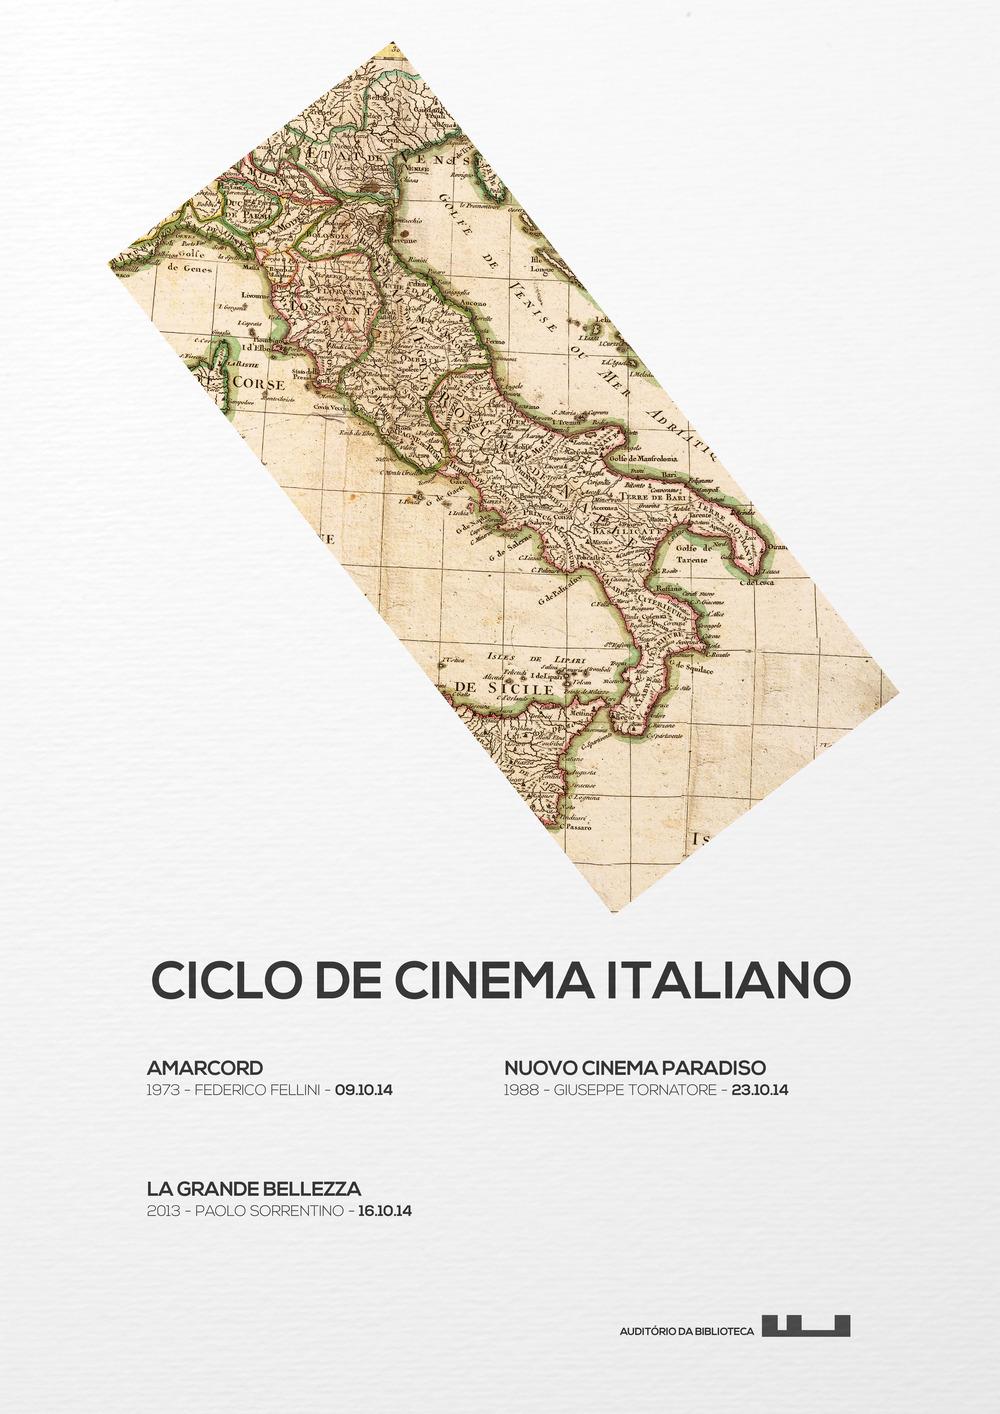 ciclo italiano.jpg